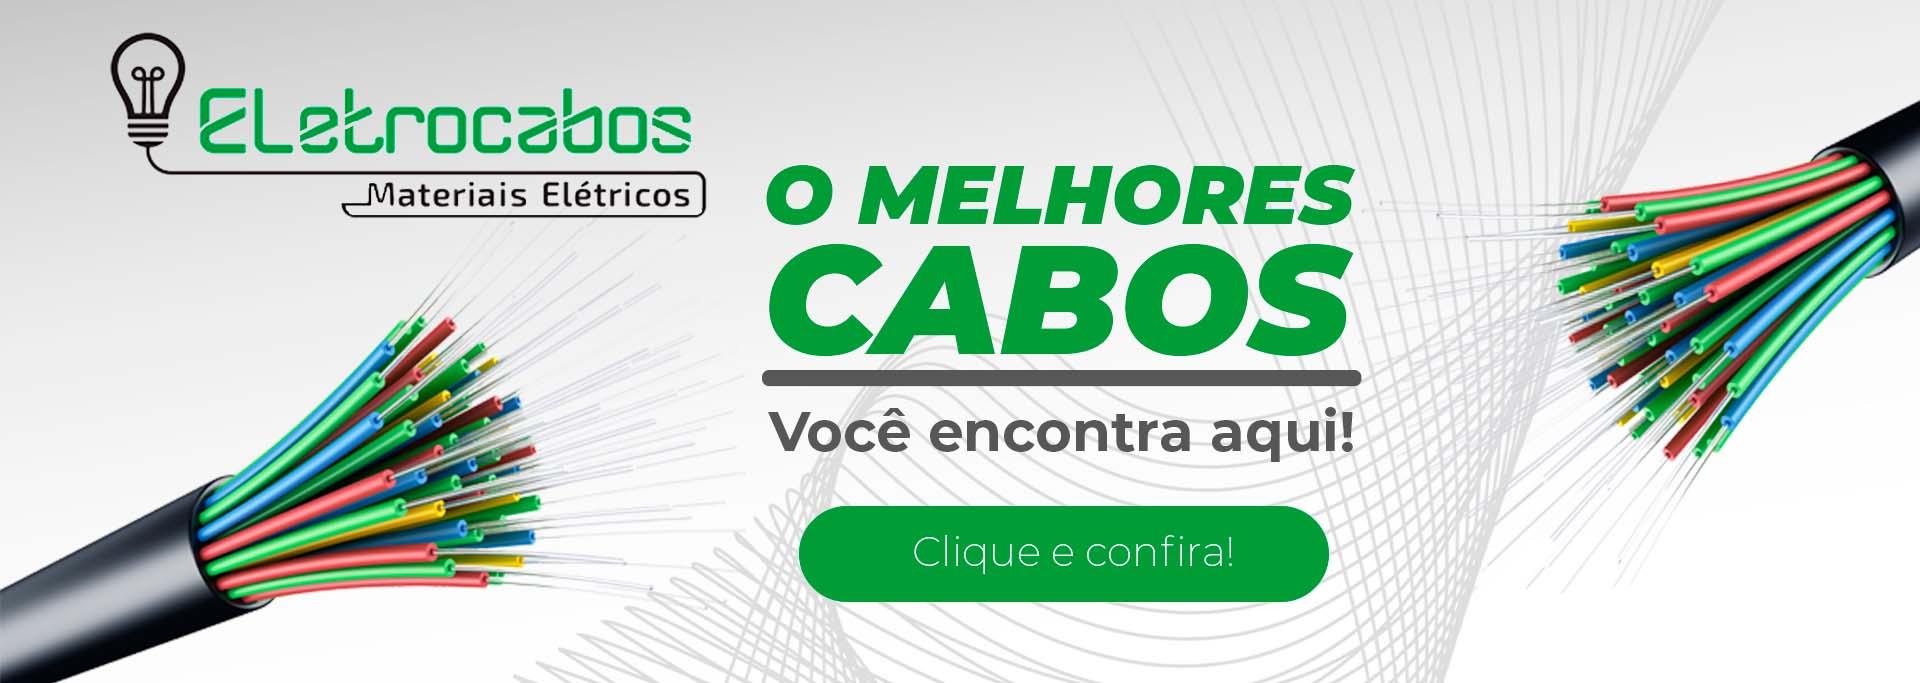 Eletrocabos-banner-1